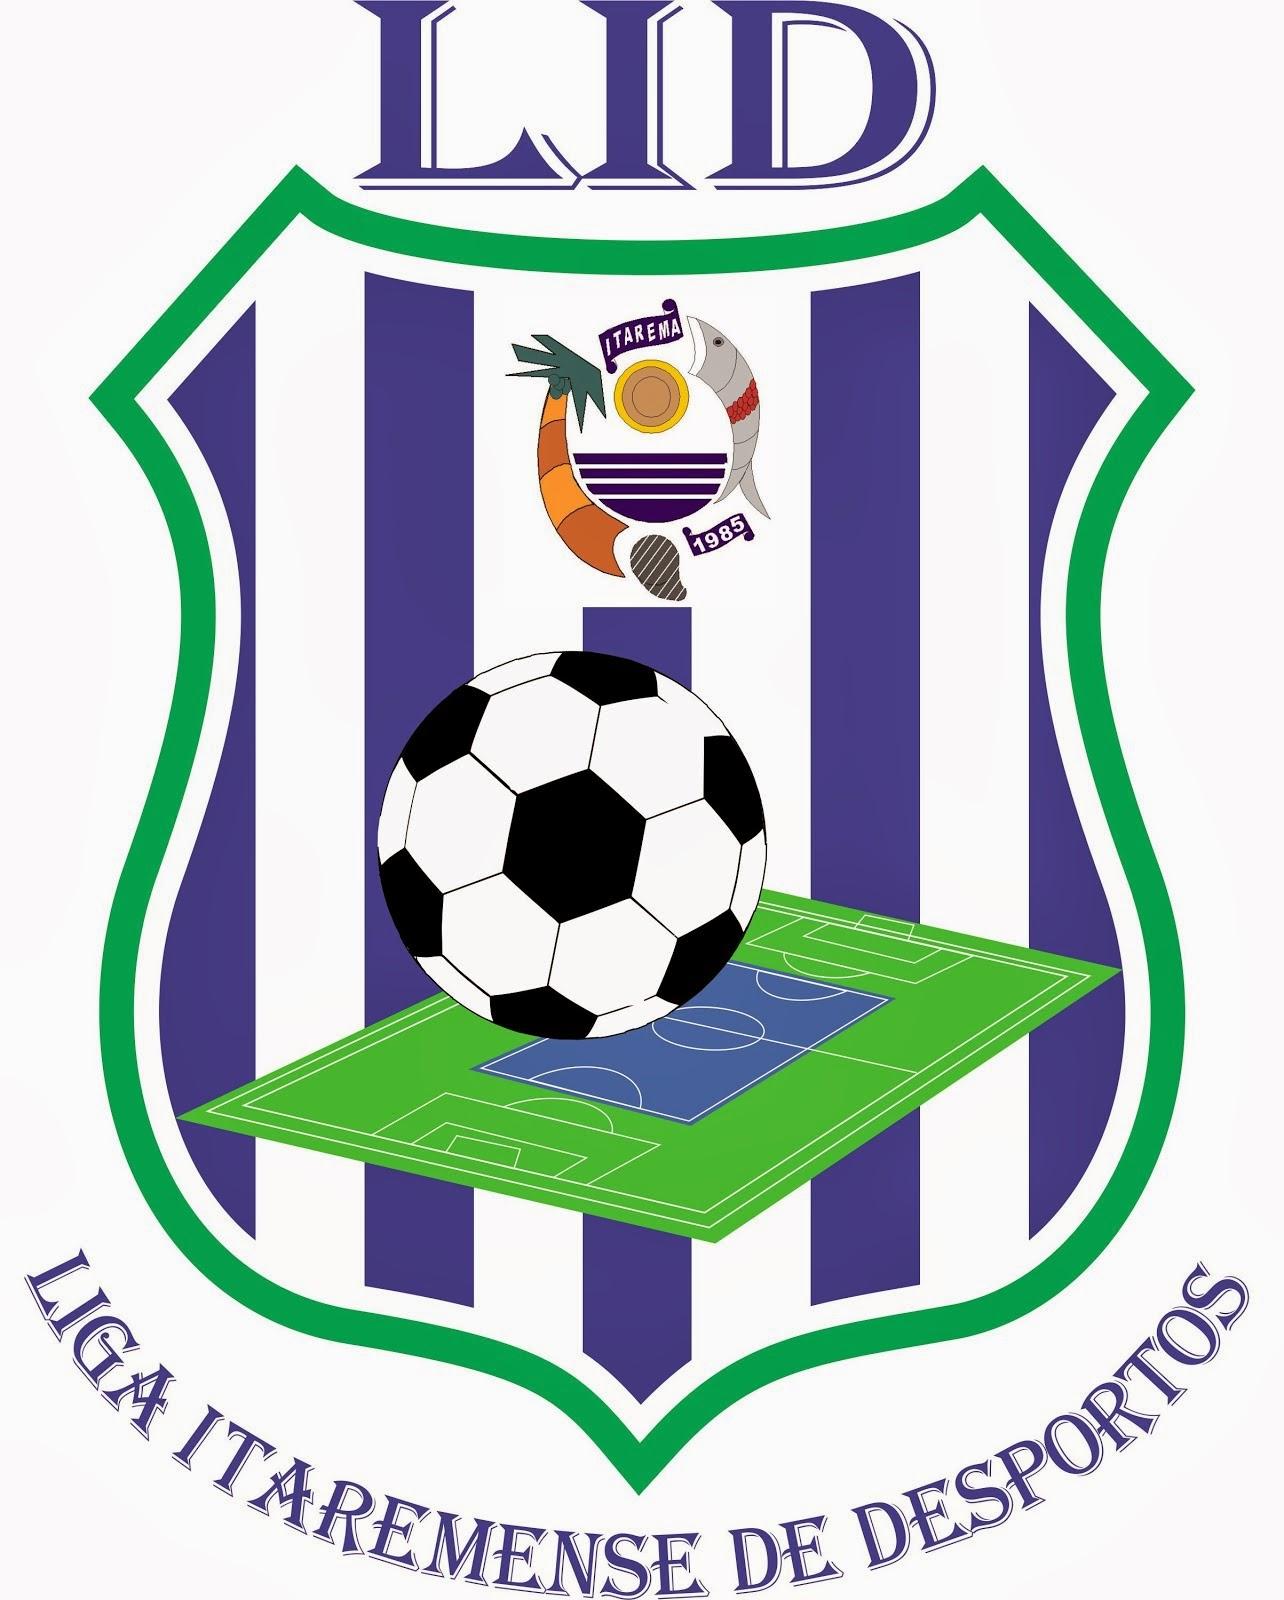 Liga Itaremense de Desportos - LID